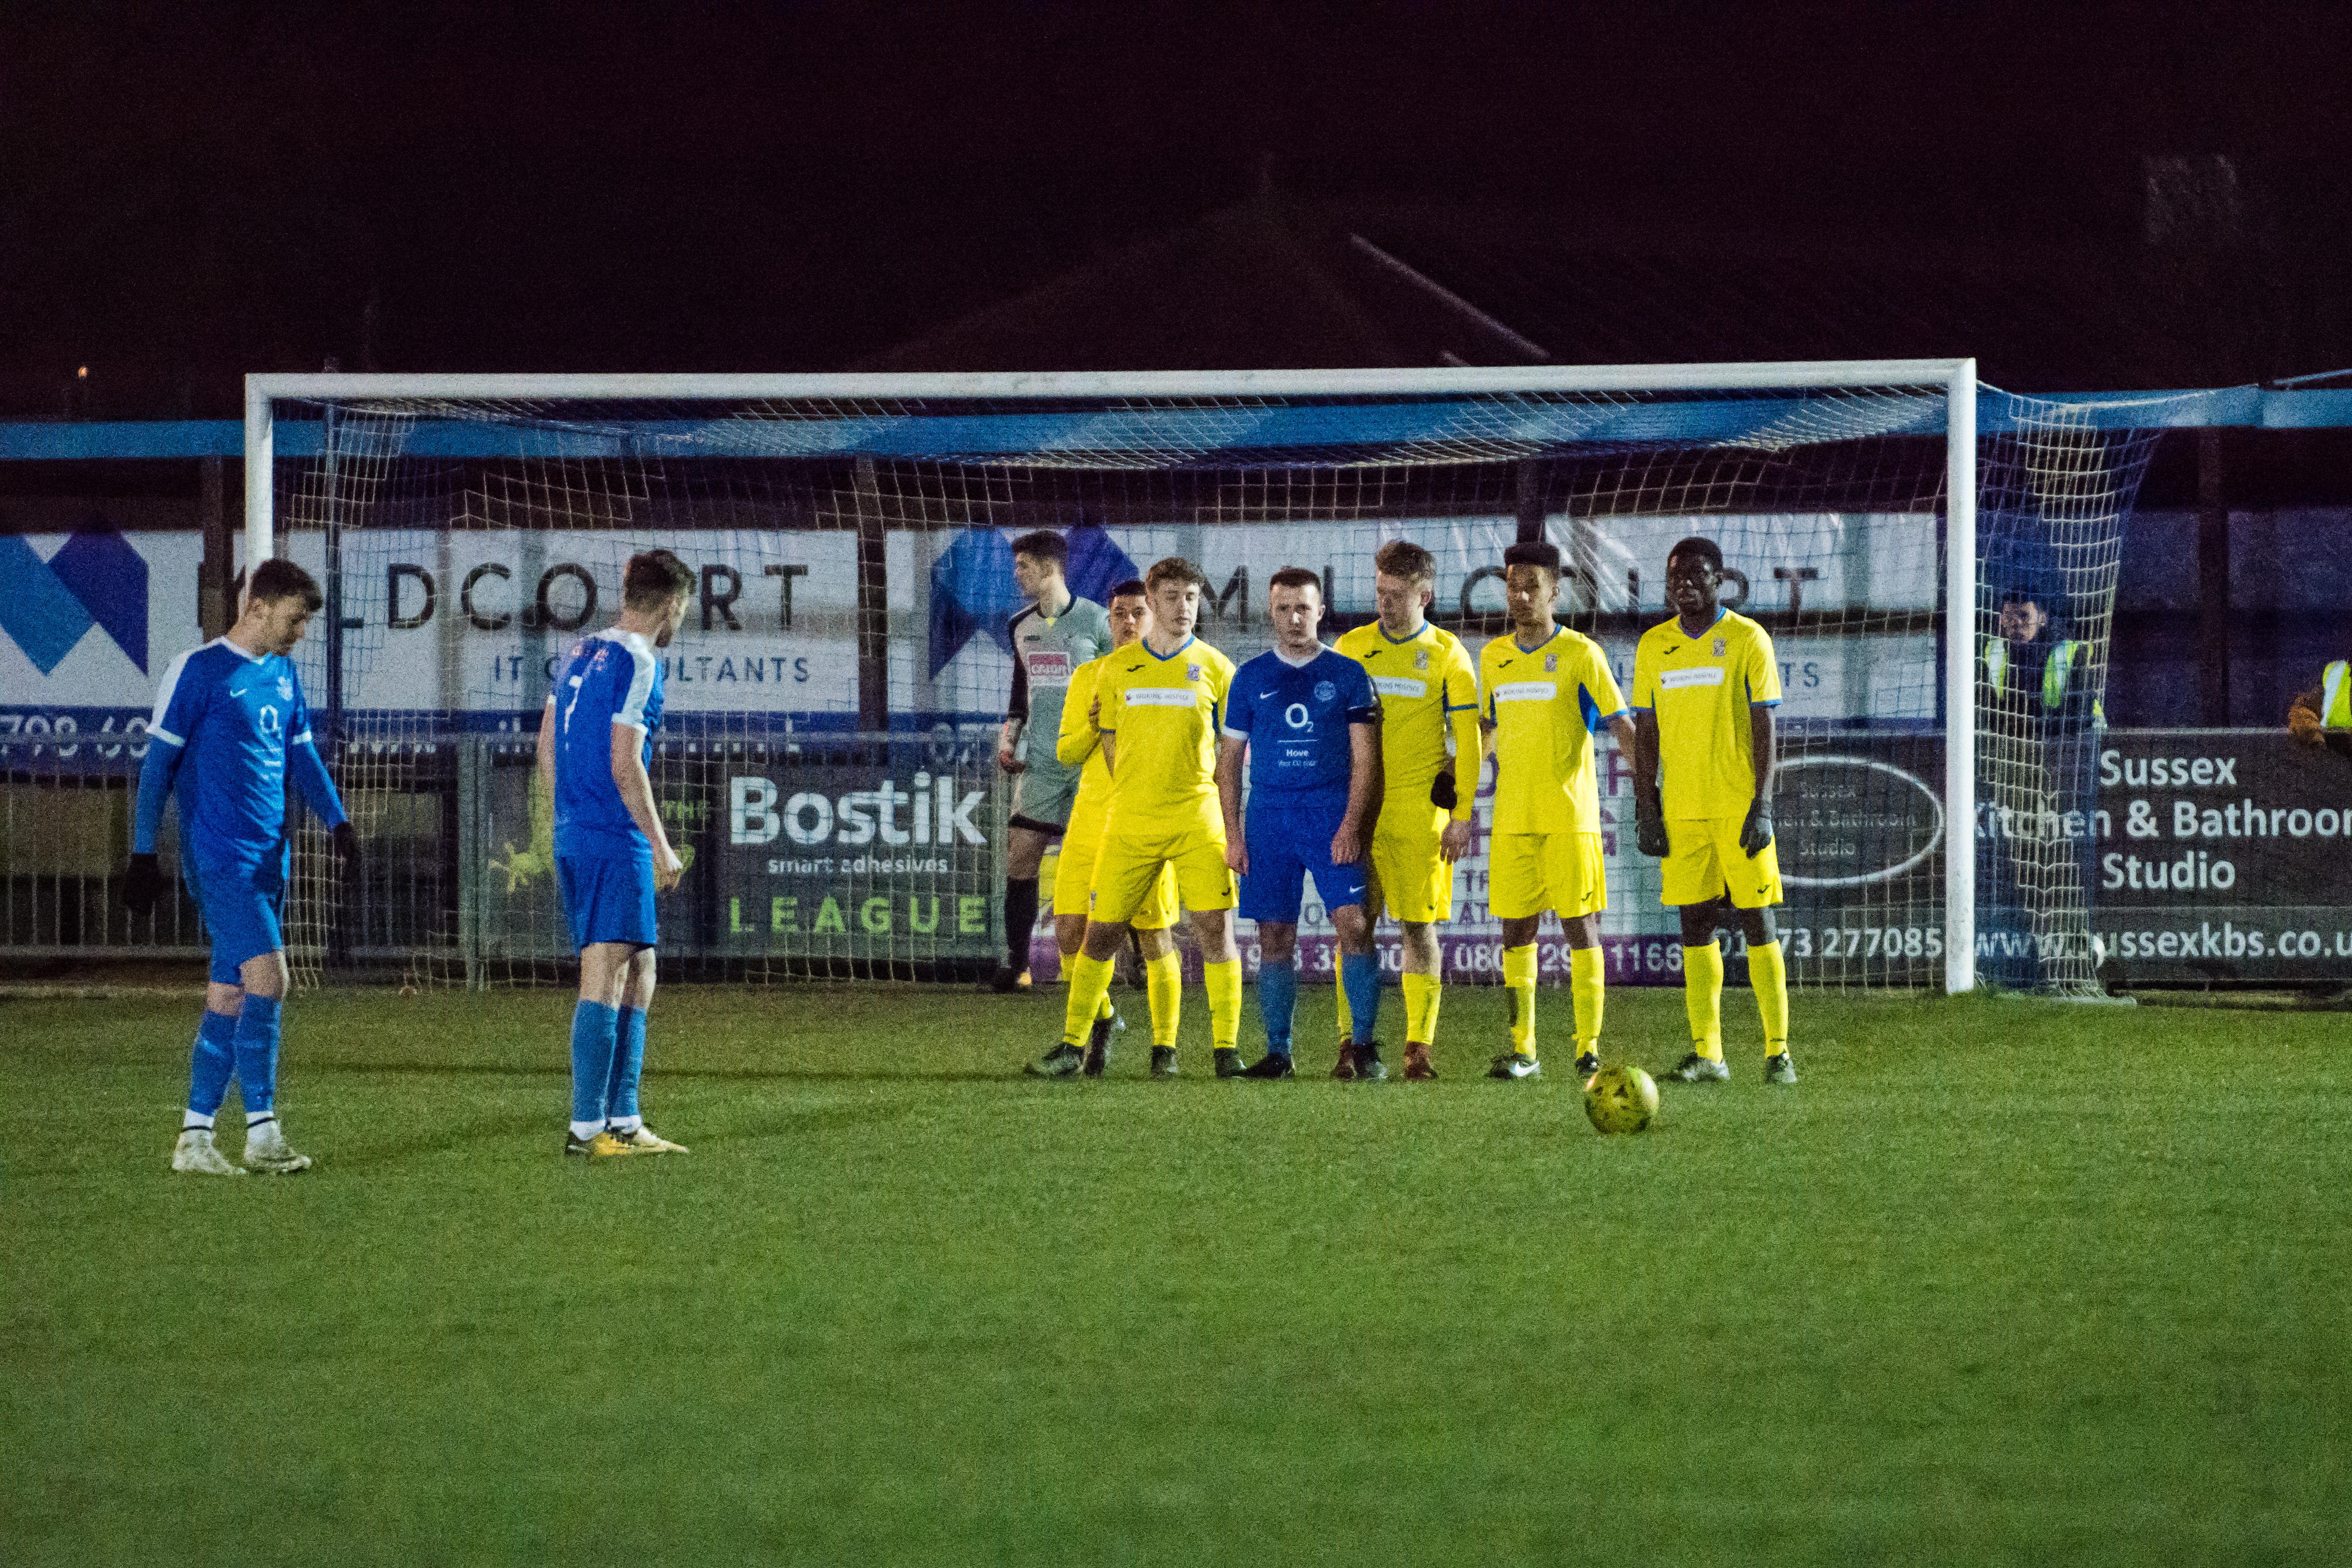 DAVID_JEFFERY Shoreham FC U18s vs Woking FC Academy 22.03.18 62